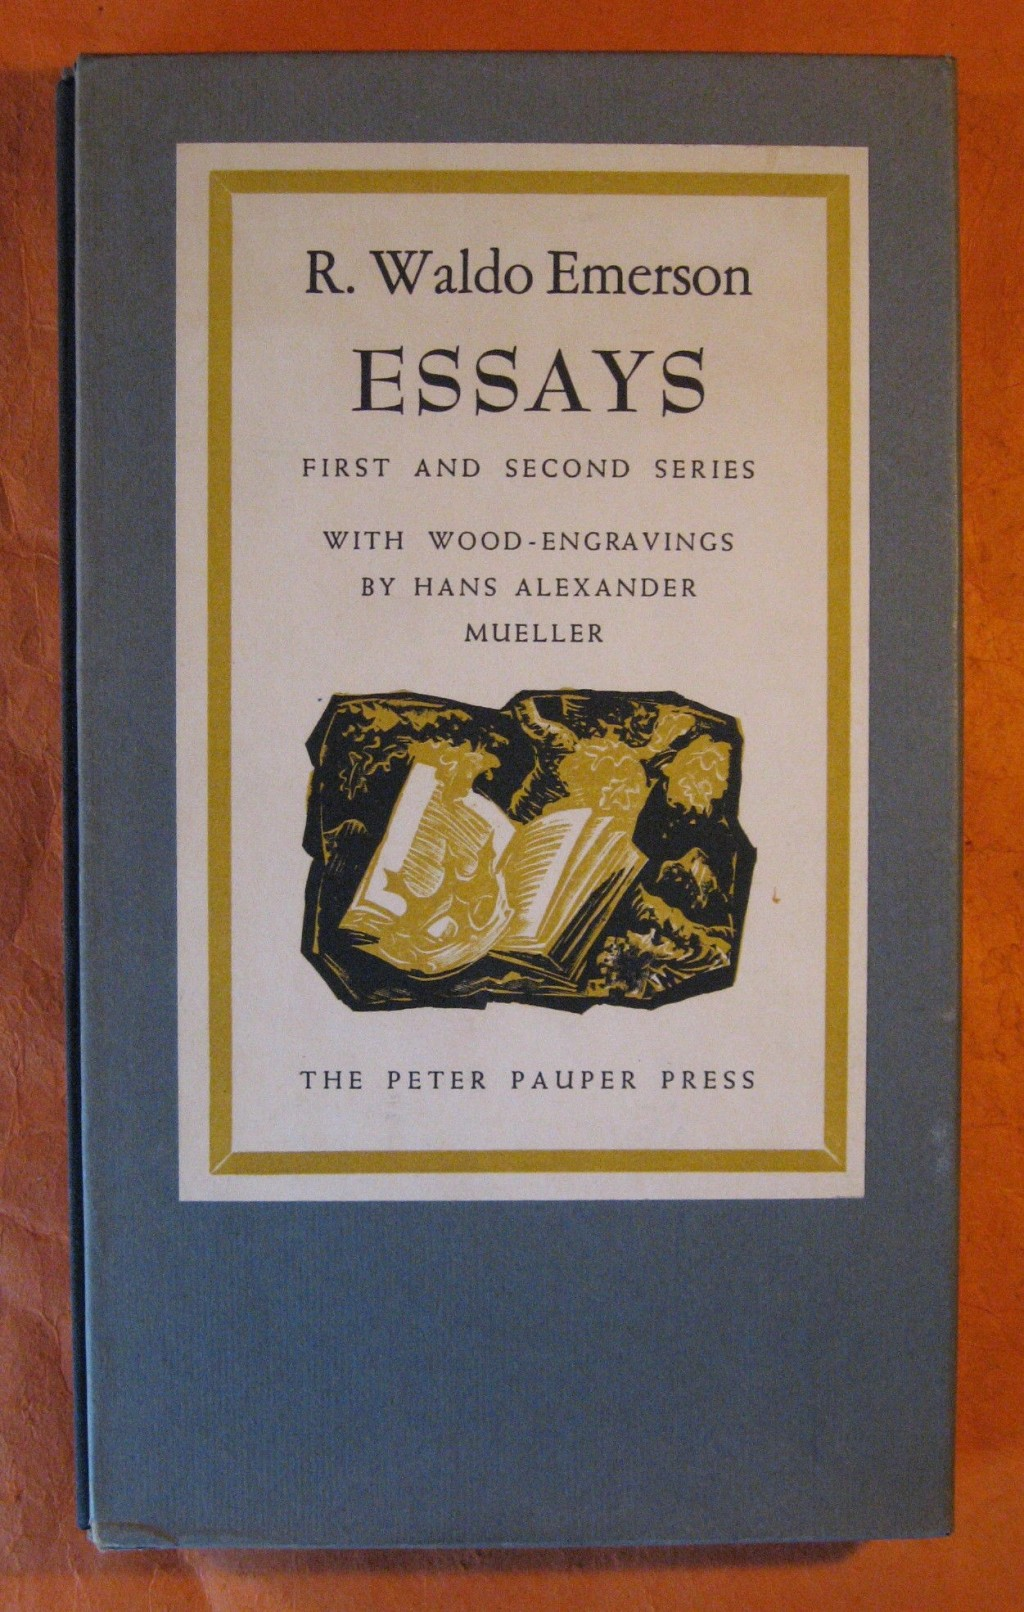 012 Essays First Series X Essay Stunning In Zen Buddhism Emerson's Value Large